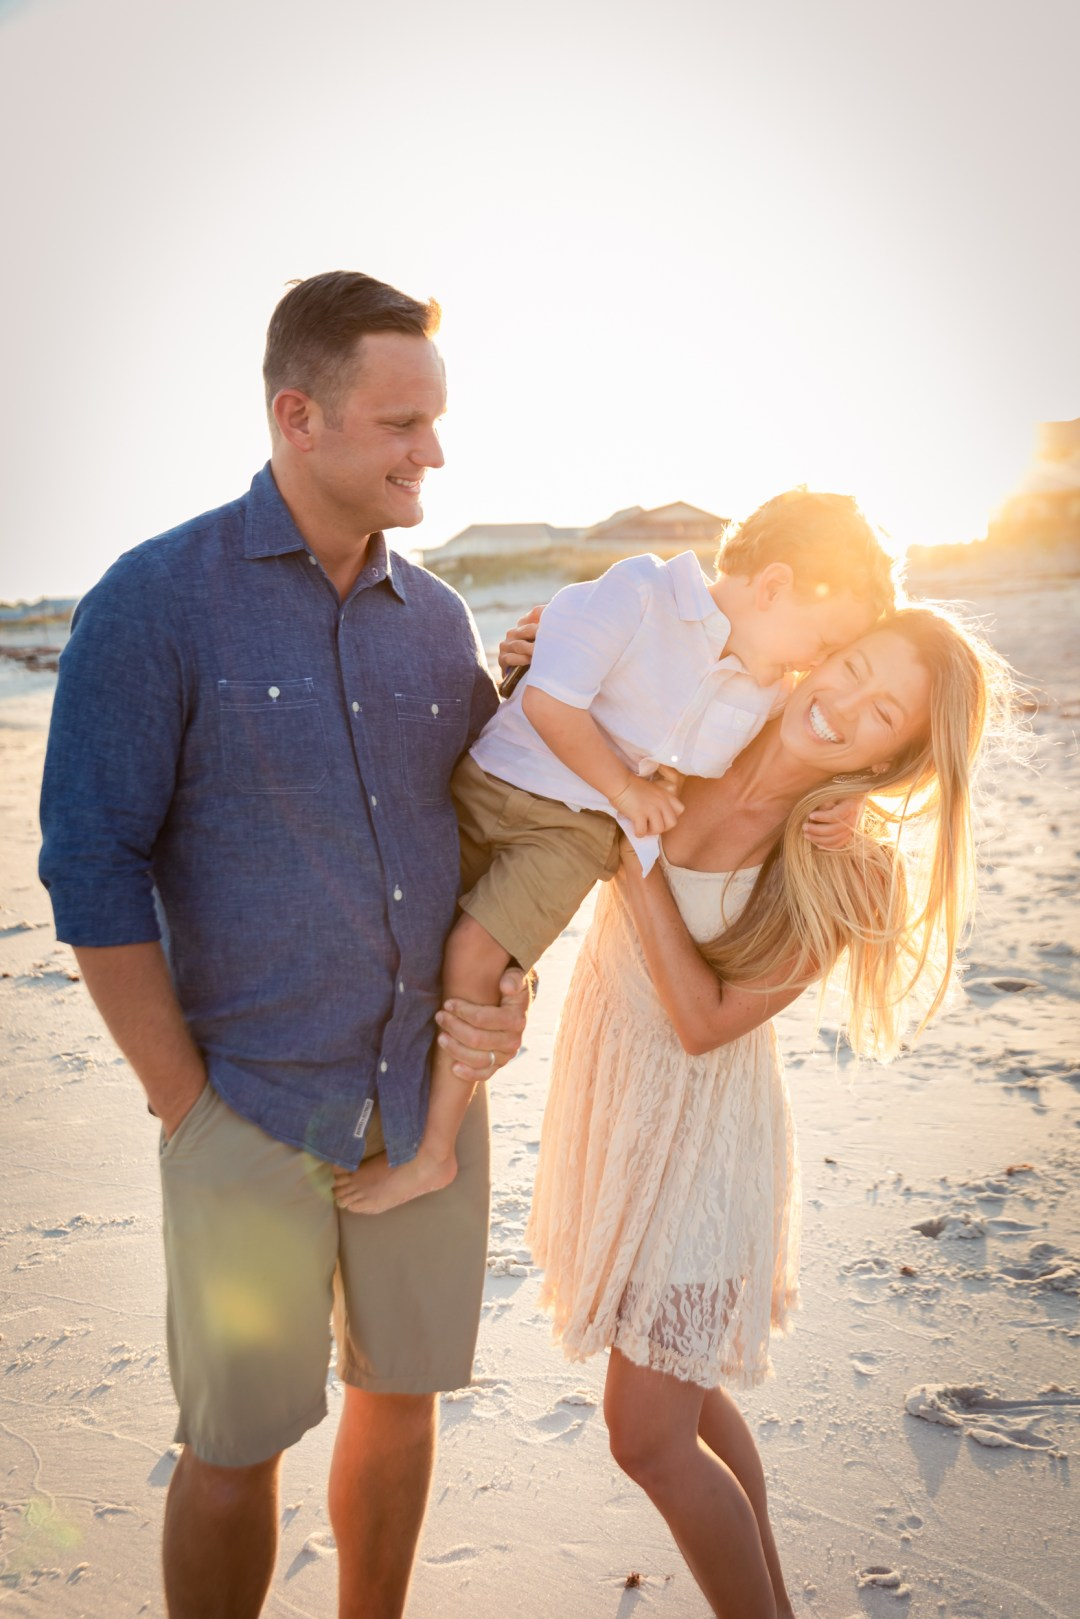 family beach photography in Gulf Shores, Alabama